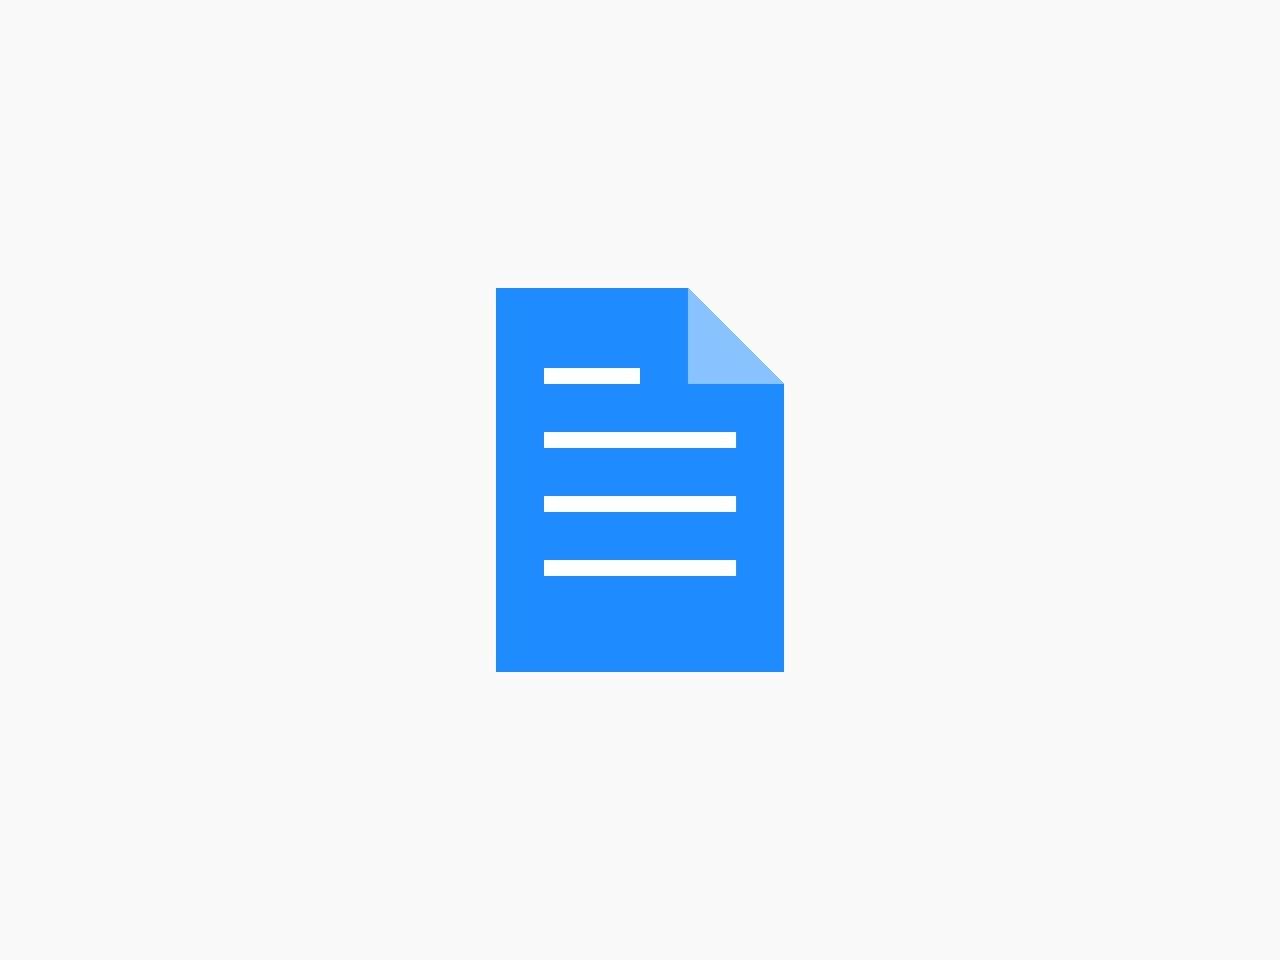 Fire loss Rs 1,000 cr; BCG, rota vaccines capacity hit: Serum